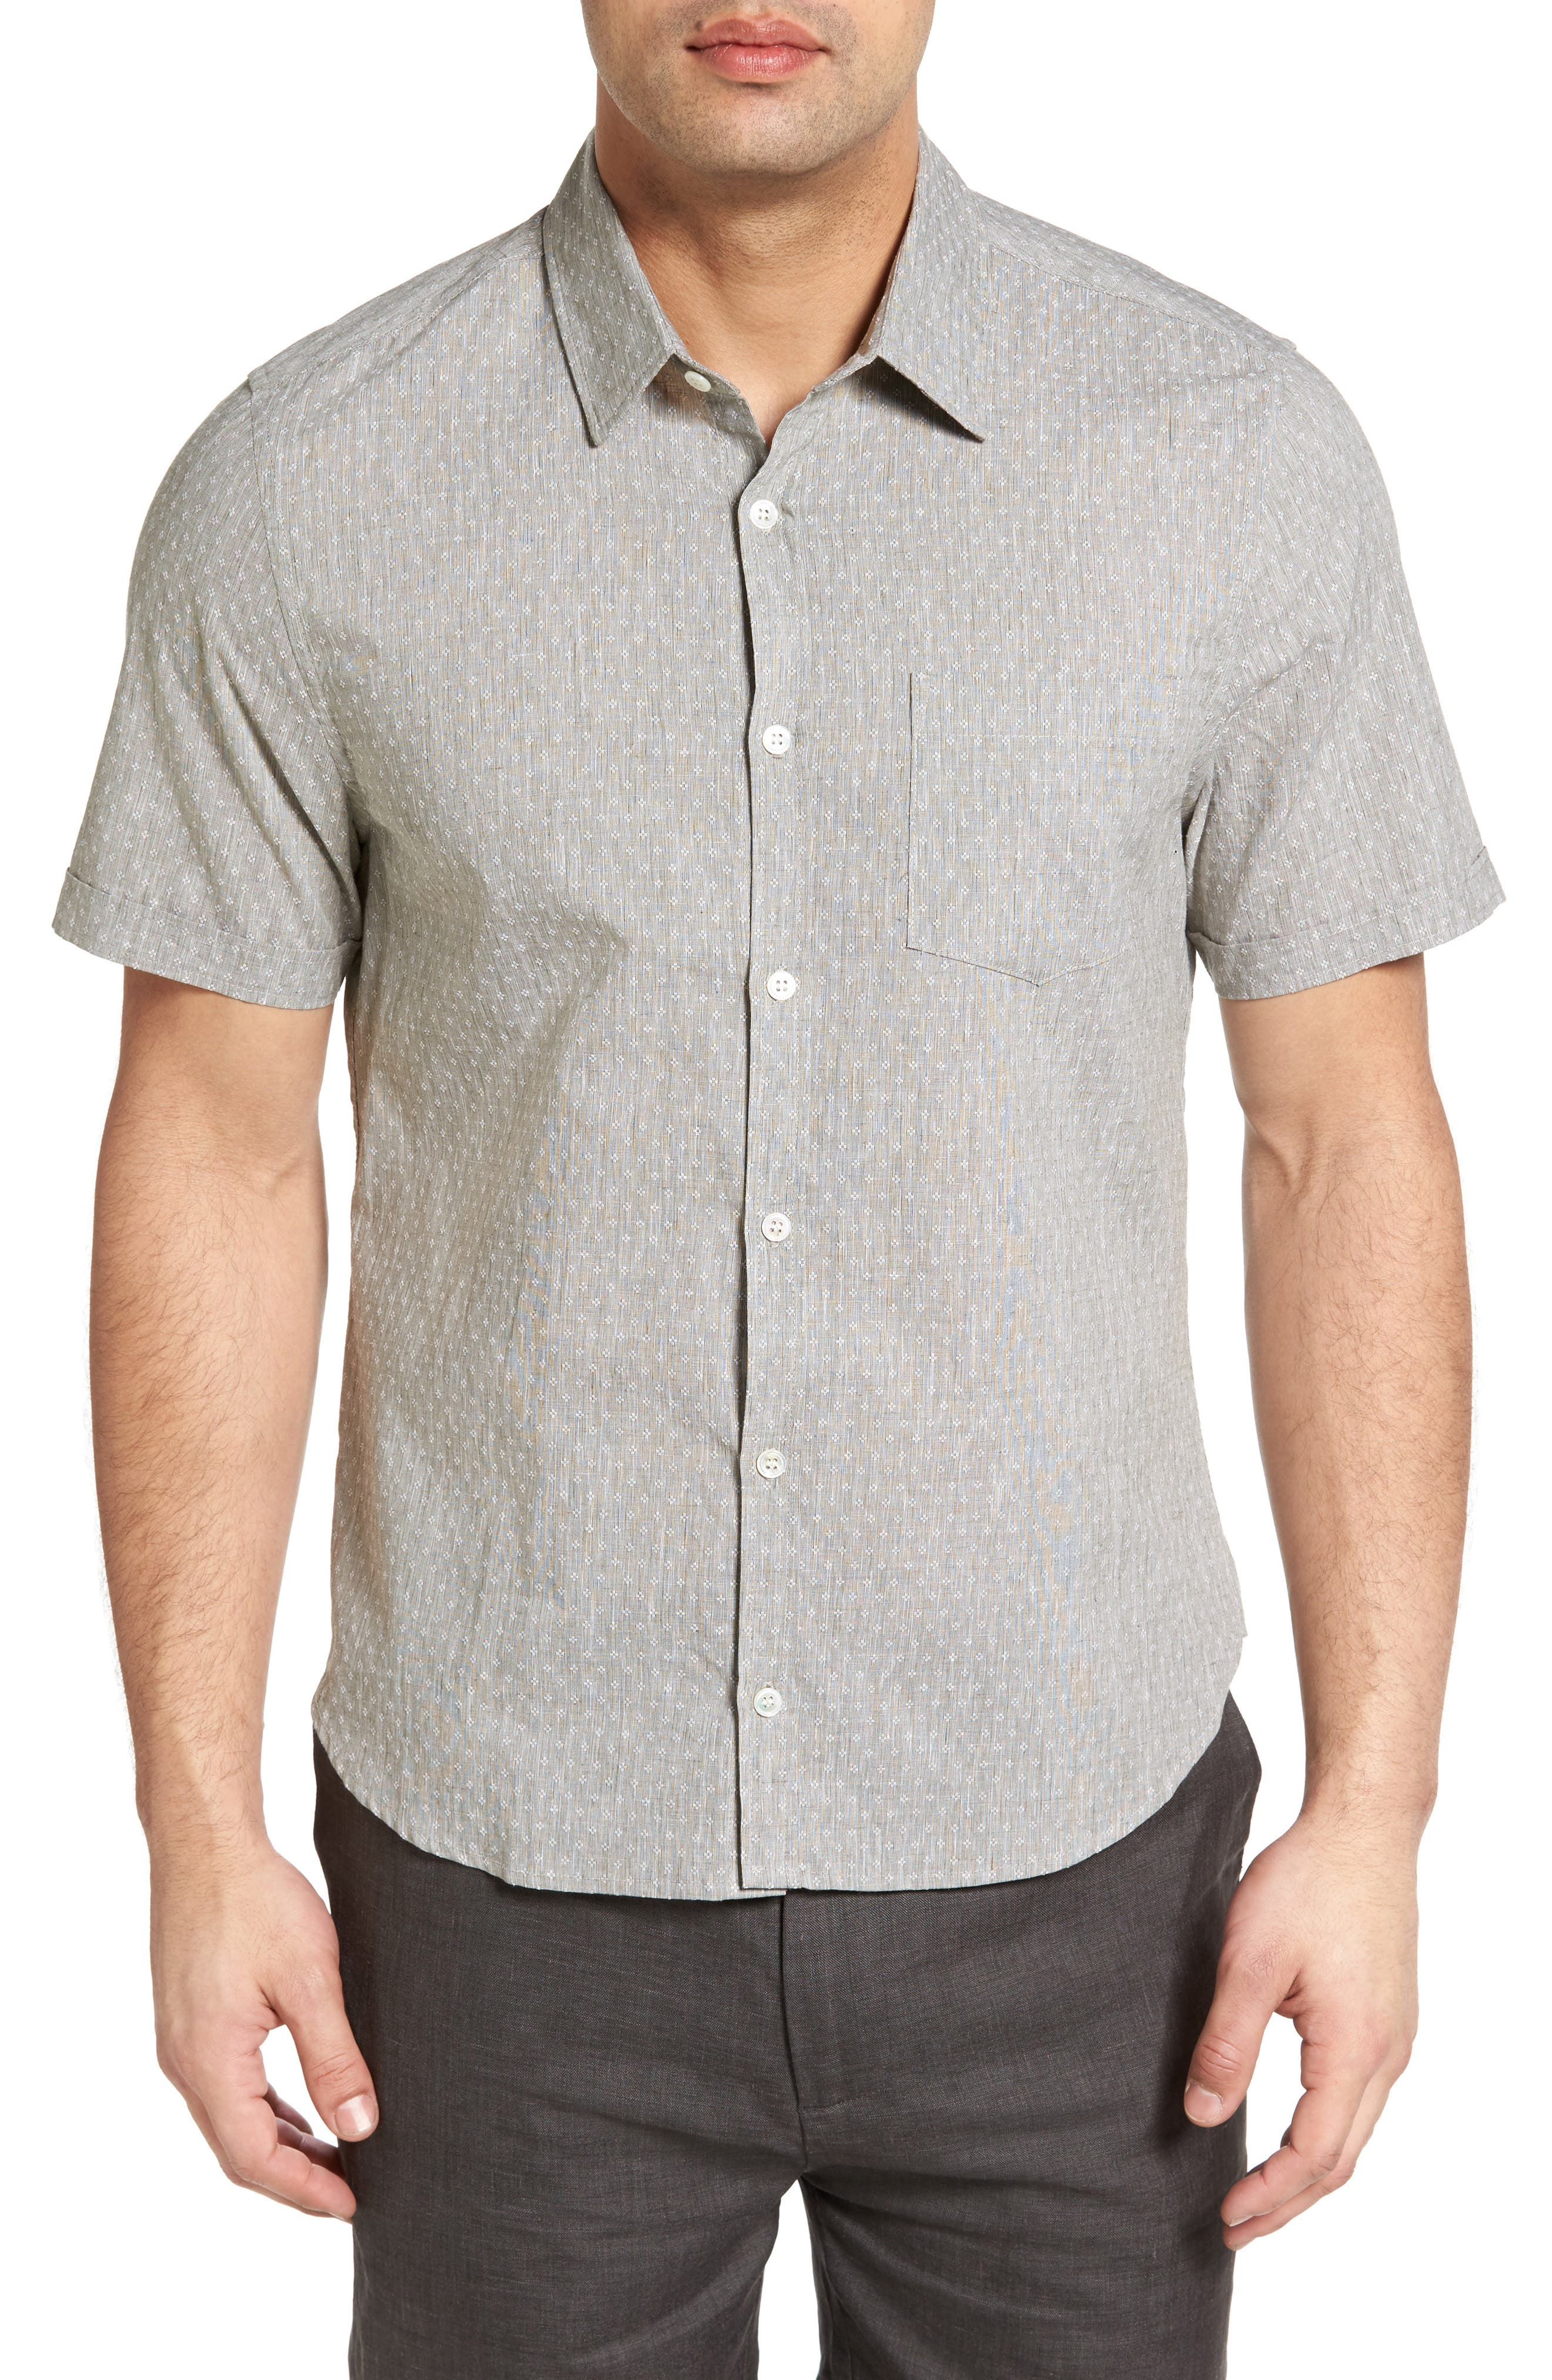 LANAI COLLECTION,                             Classic Fit Sport Shirt,                             Main thumbnail 1, color,                             310